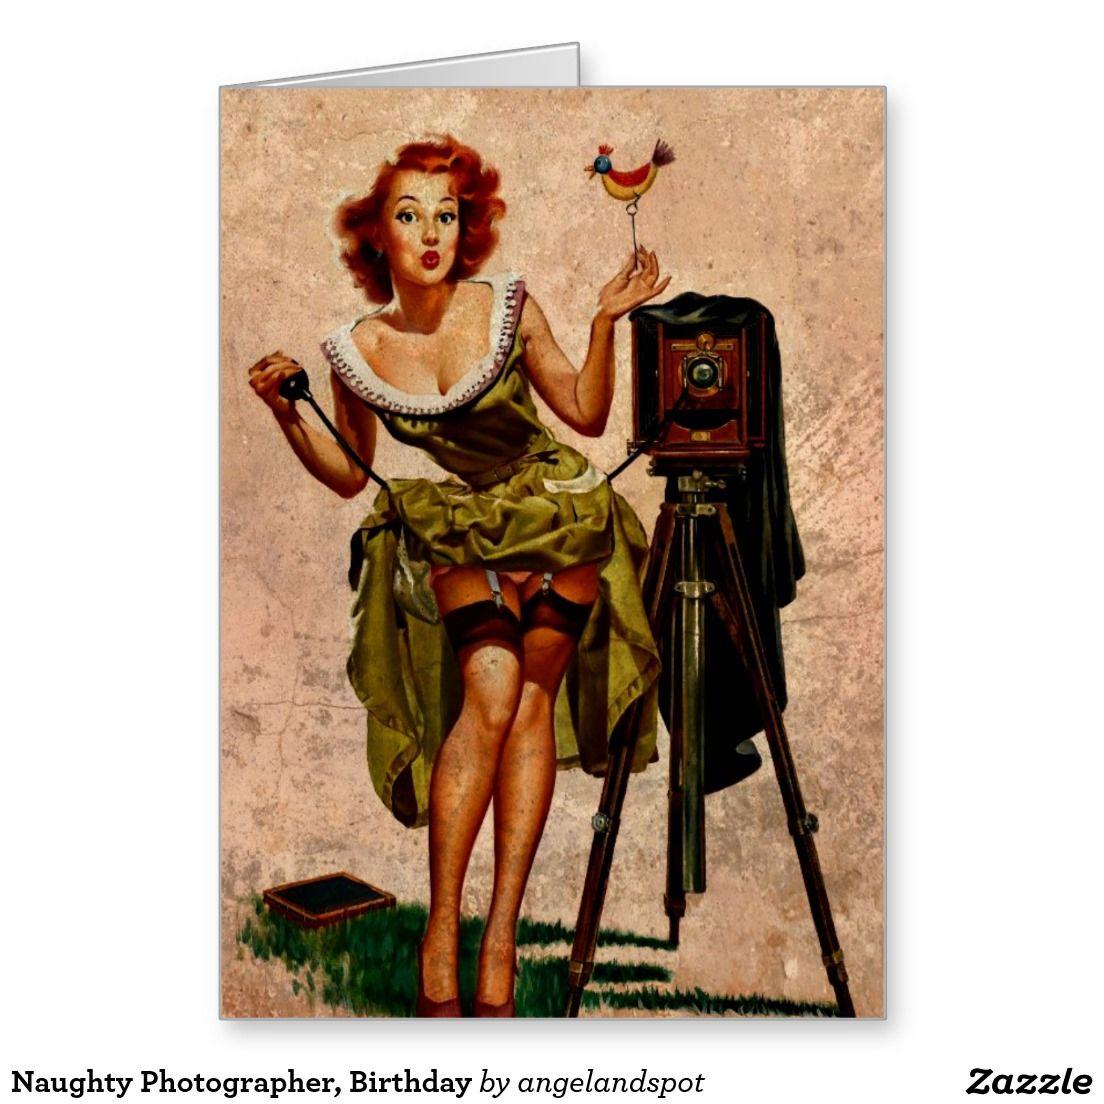 Naughty Photographer Birthday Greeting Card – Photographer Birthday Card